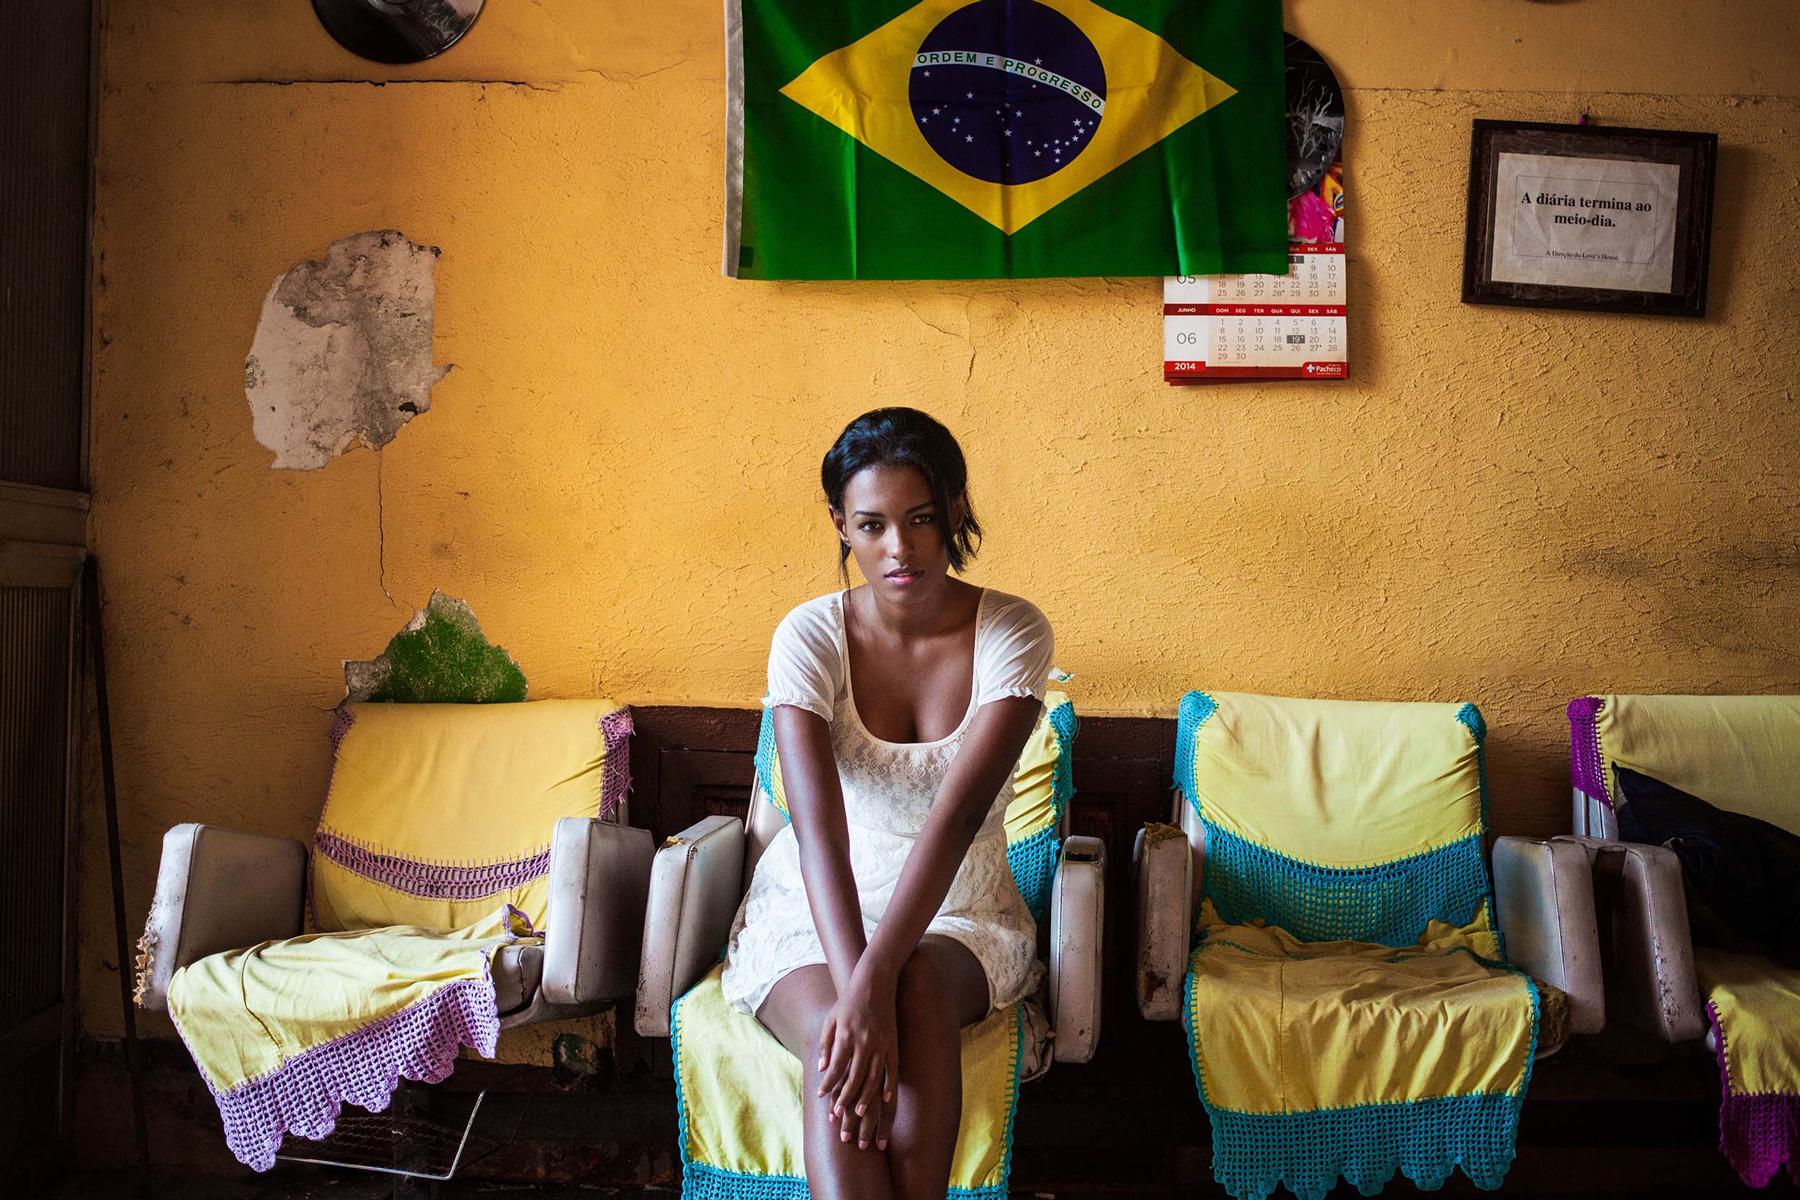 Mihaela-Noroc-Atlas-of-Beauty-Rio-de-Janeiro